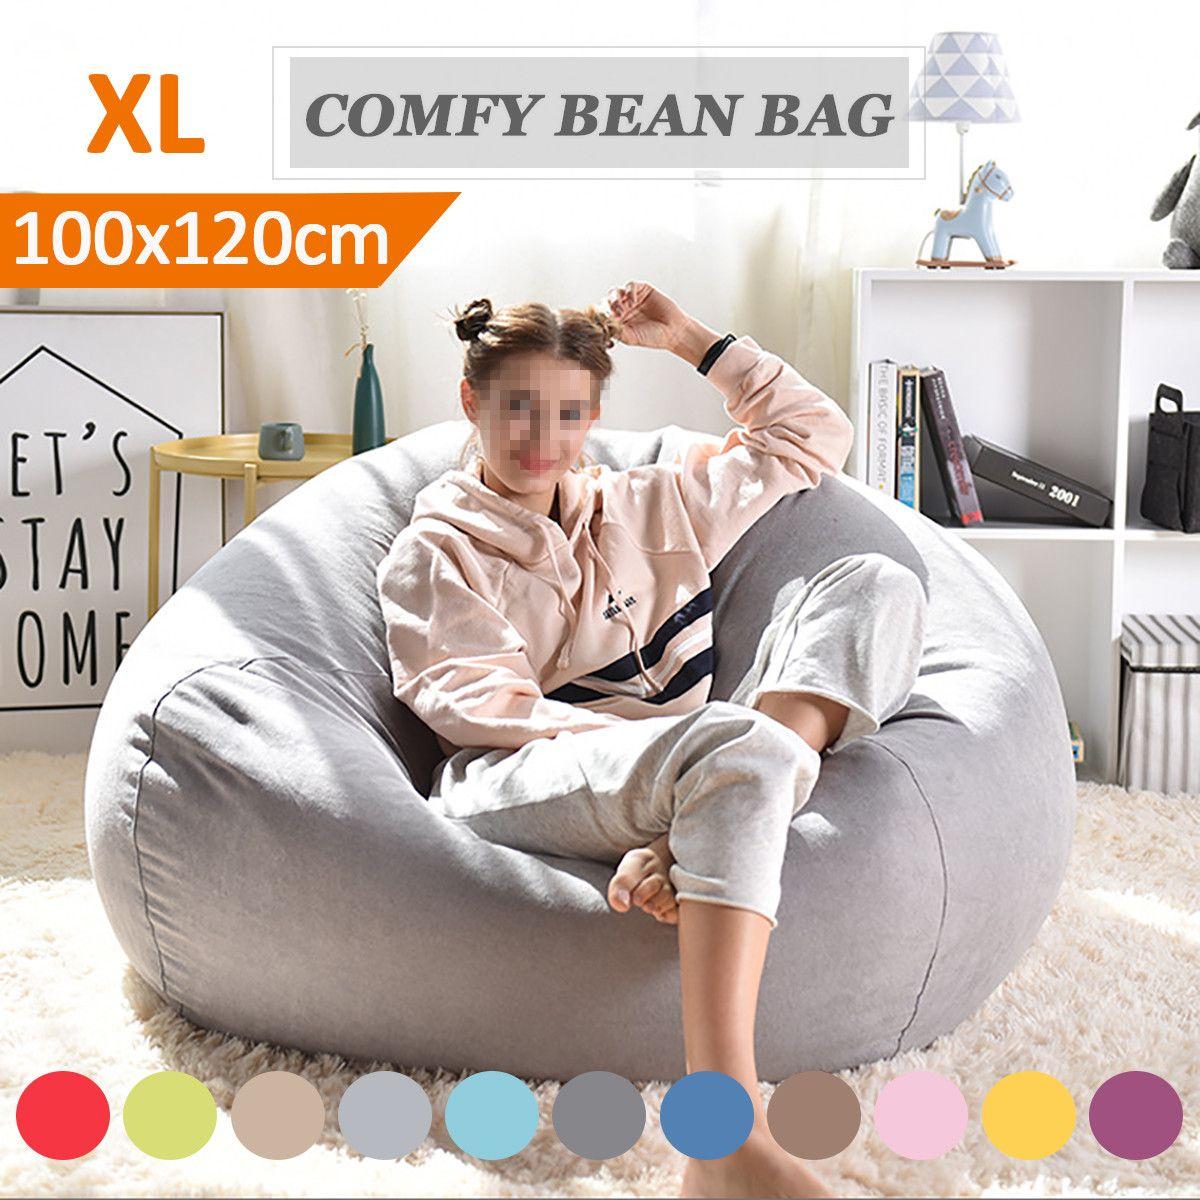 Lazy BeanBag Sofas Cover Chairs without Filler Linen Cloth Lounger Seat Bean Bag Pouf Puff Couch Tatami Living Room Furniture dřevěné dekorace do dětského pokoje